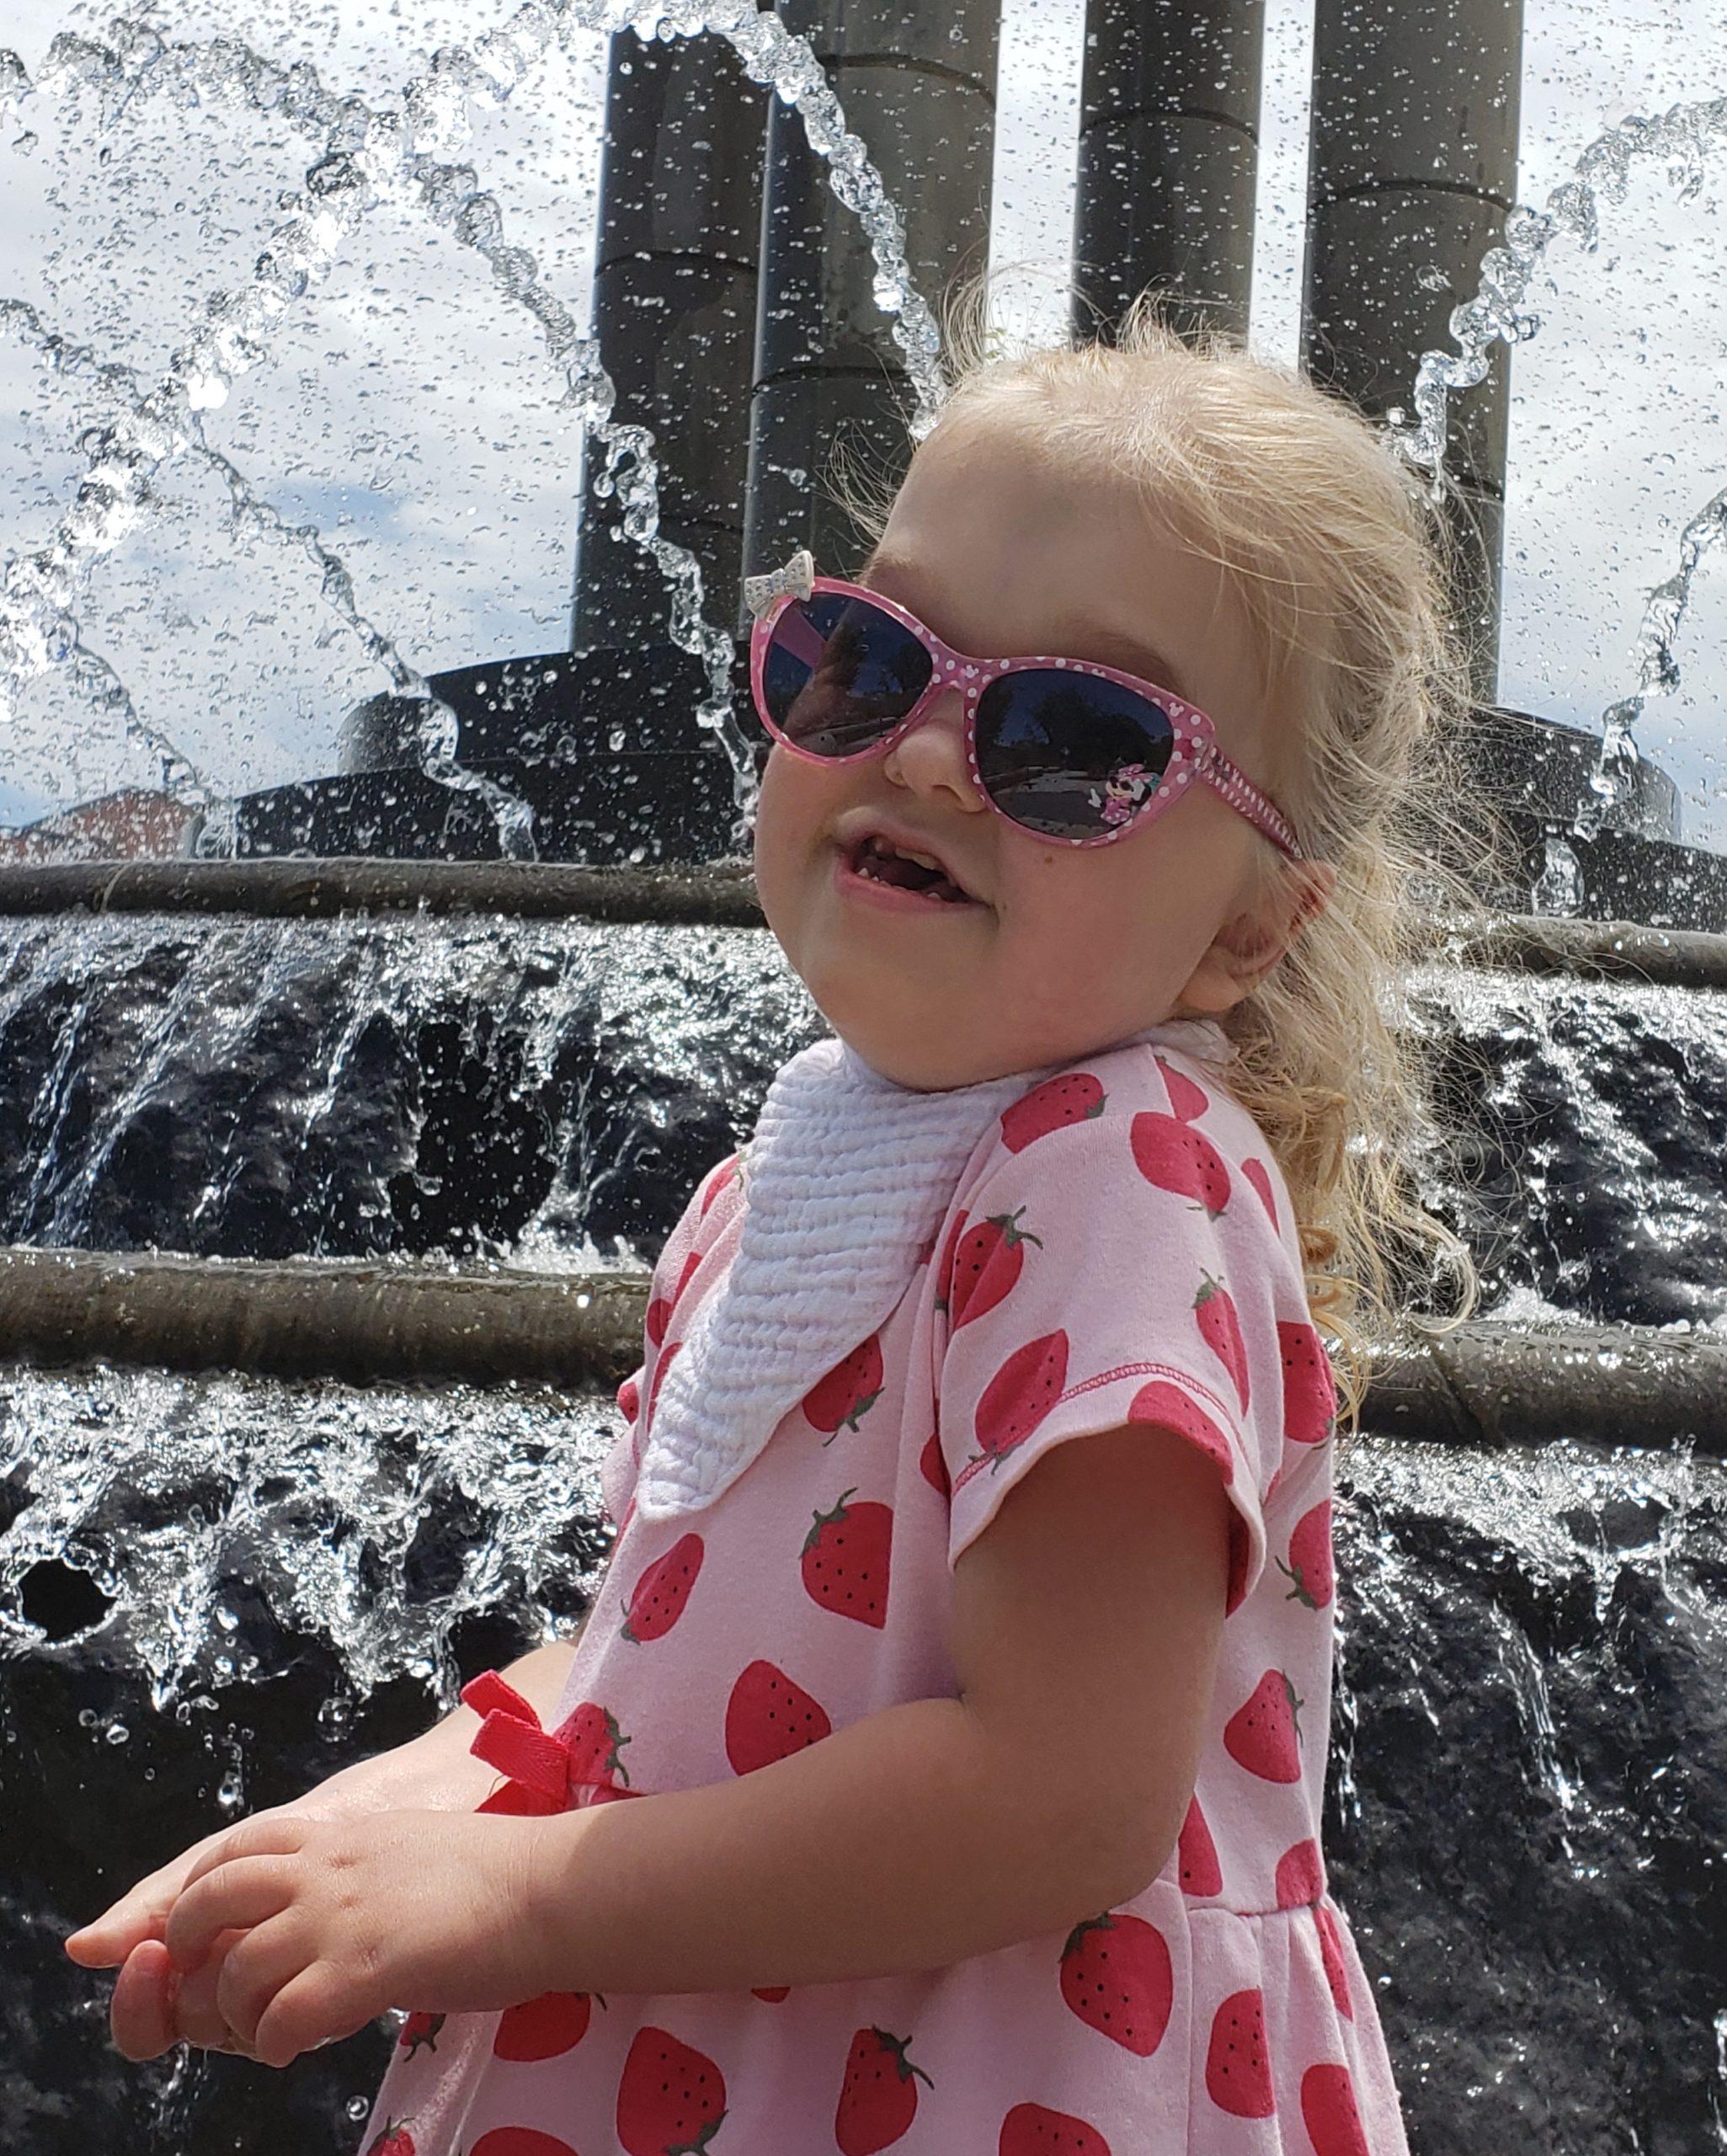 Super Mina with sunglasses on!